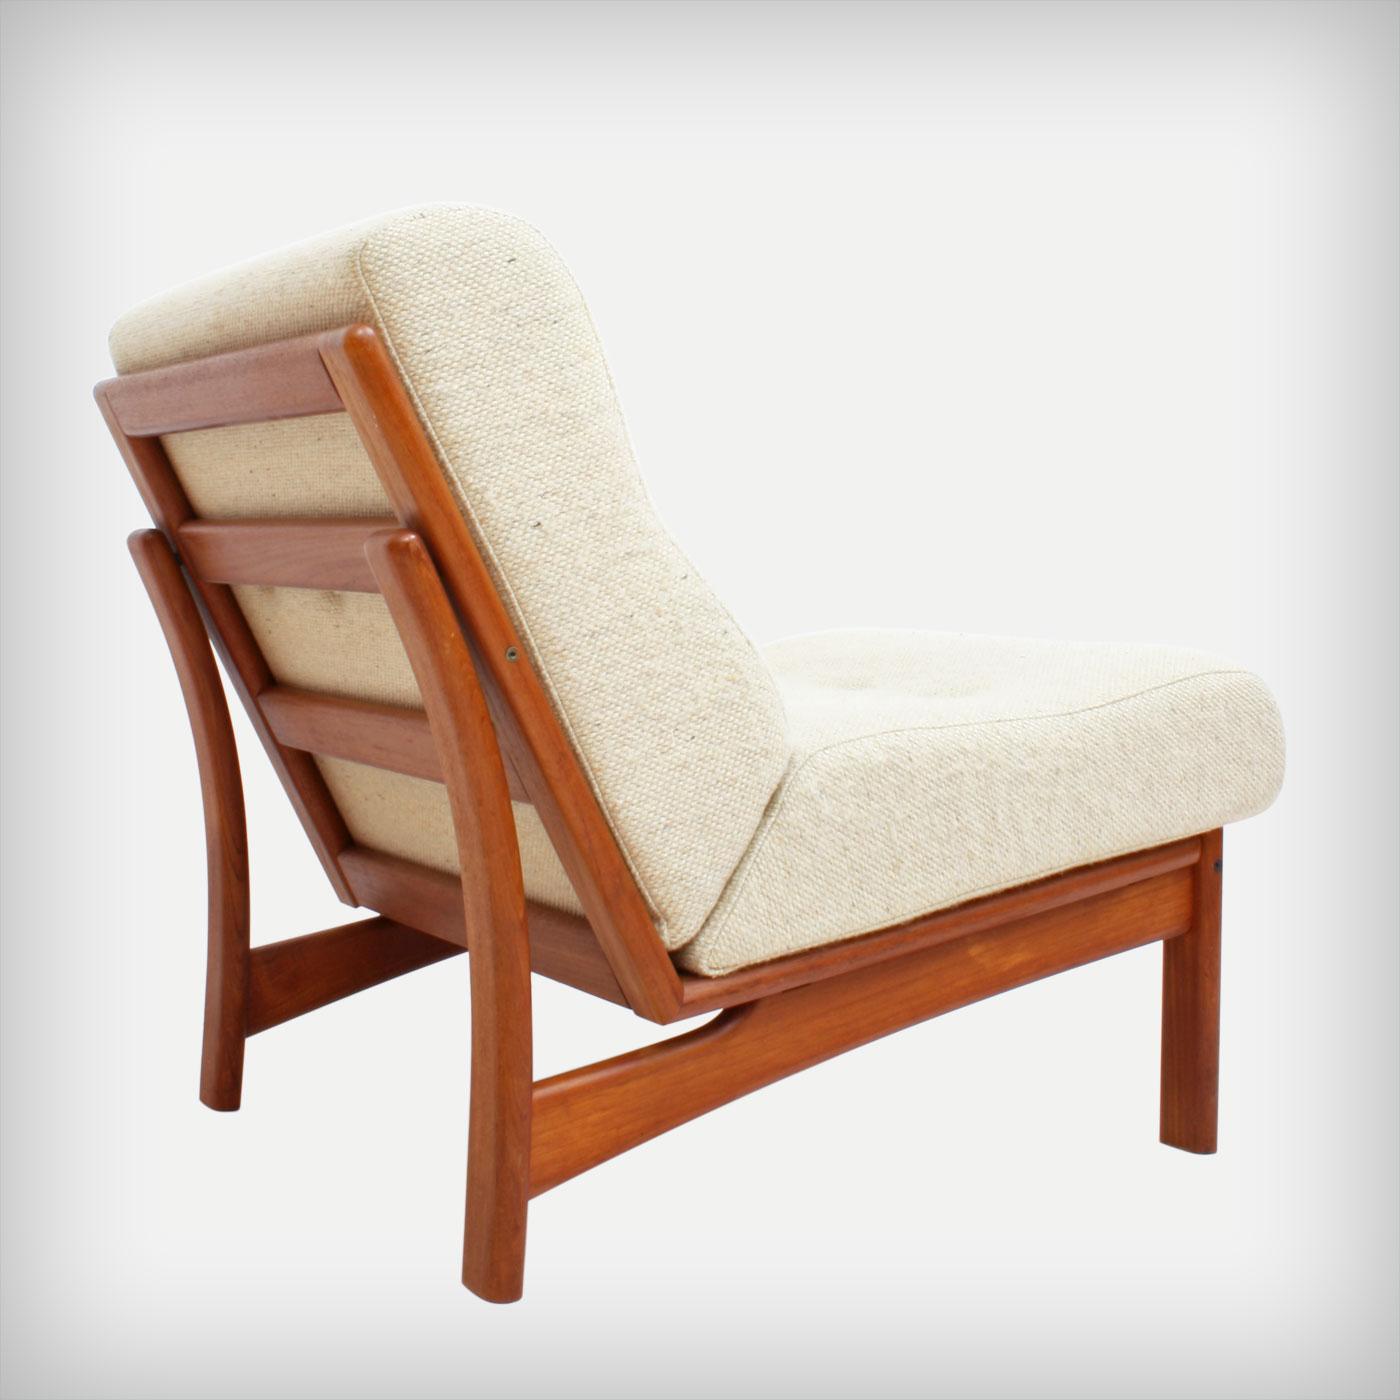 Wooden easy chair models - Wooden Easy Chair Models 31